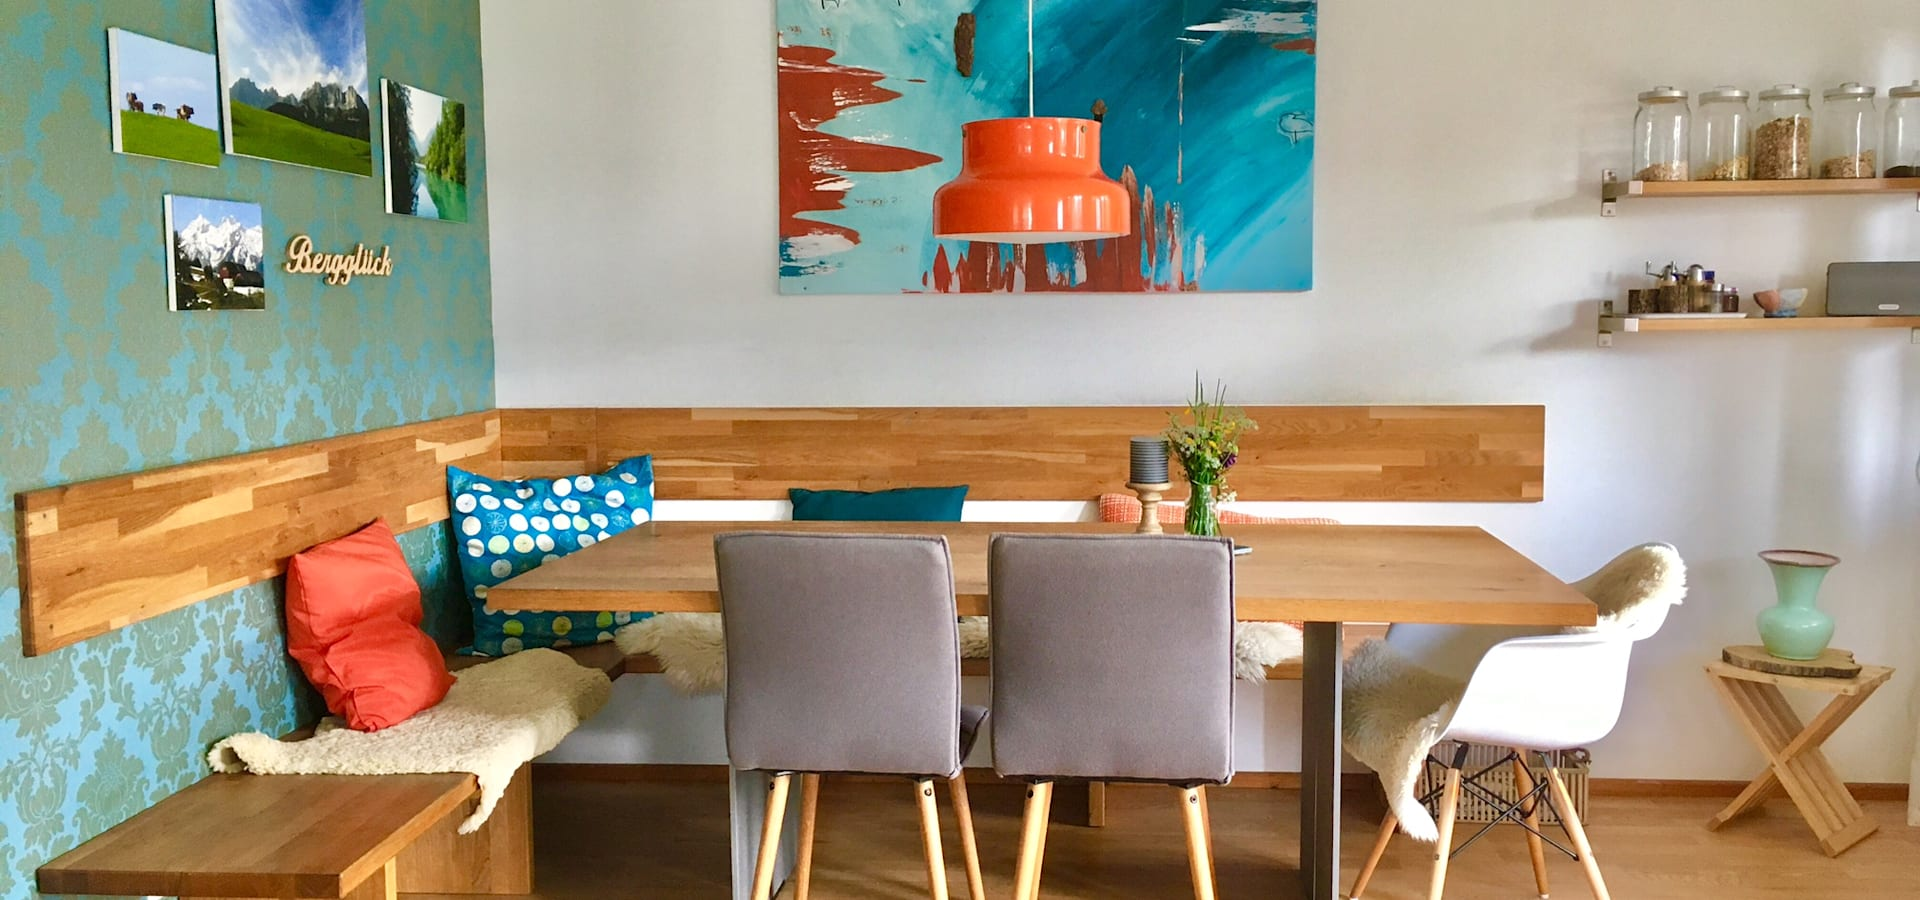 Wand Sofa Raumgestaltung Raumausstatter Interior Designer In